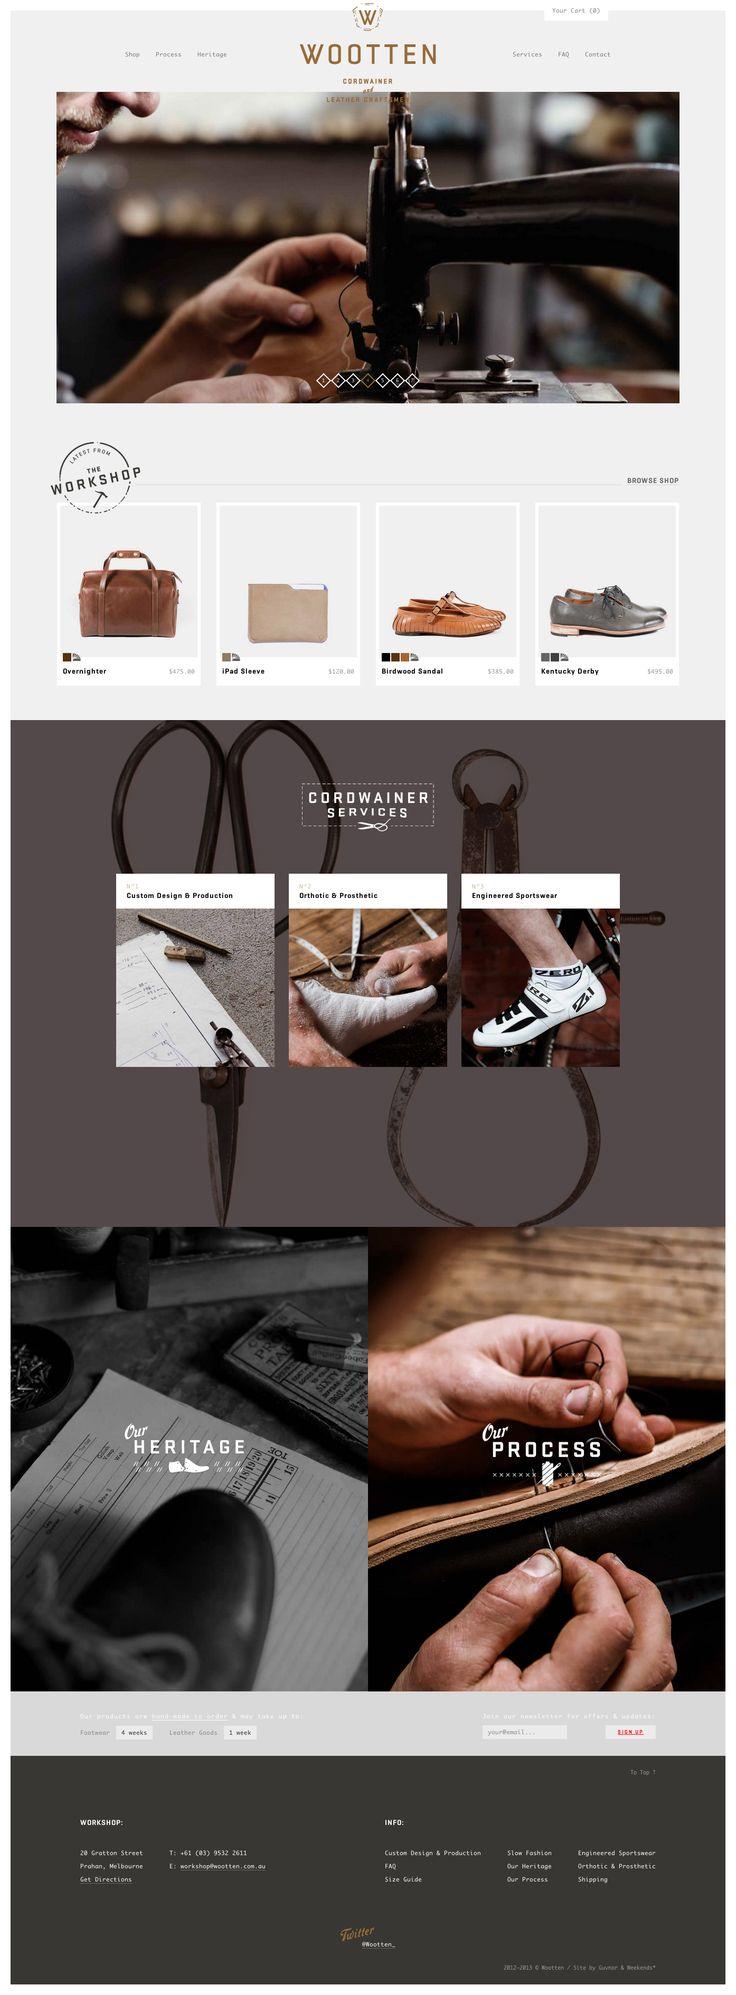 http://wootten.com.au/ #ecommerce #webdesign